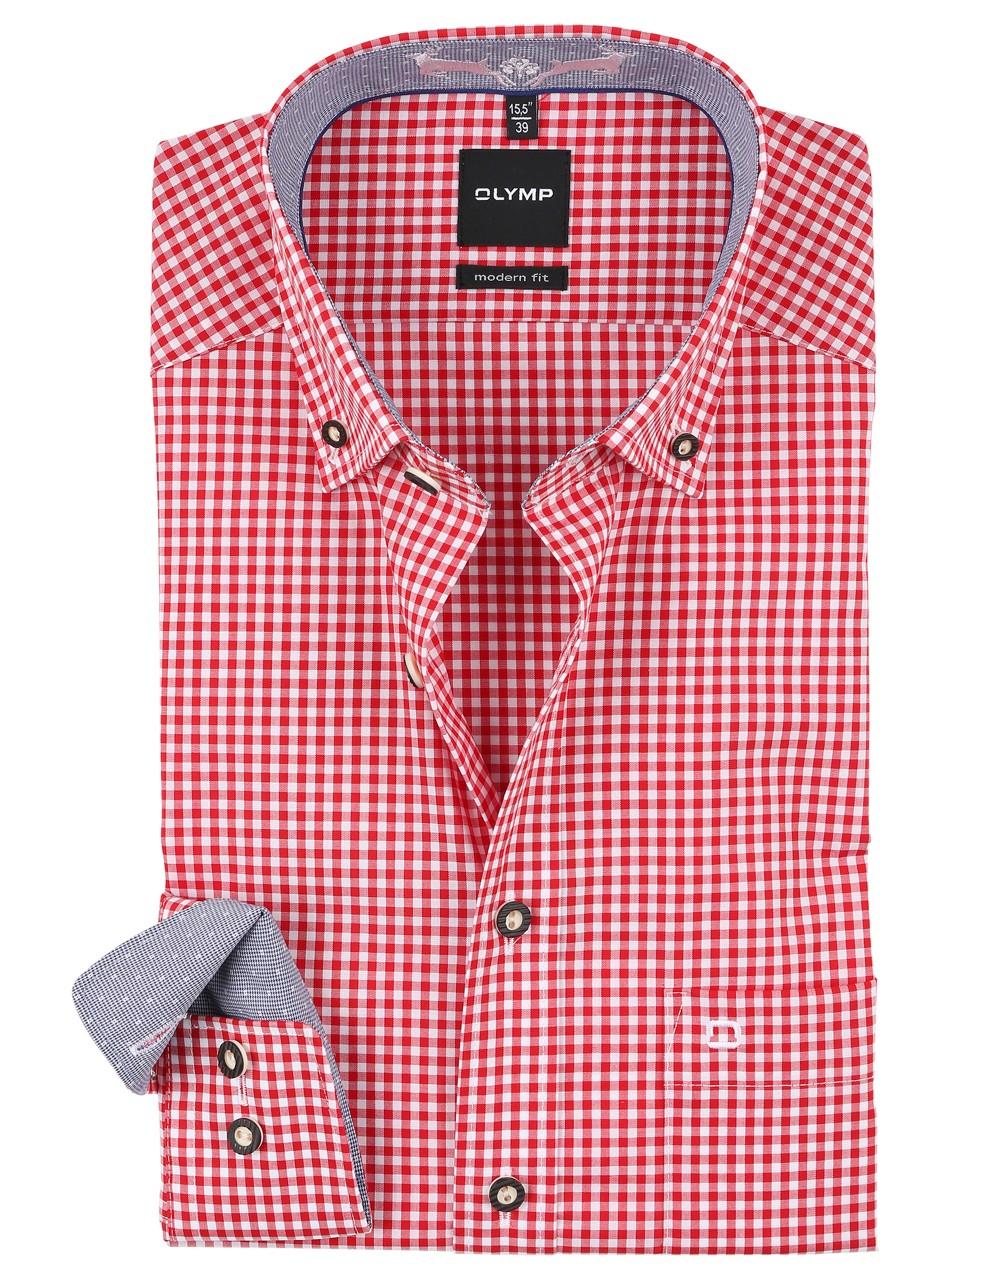 Trachten shirt Olymp rood / wit geruit